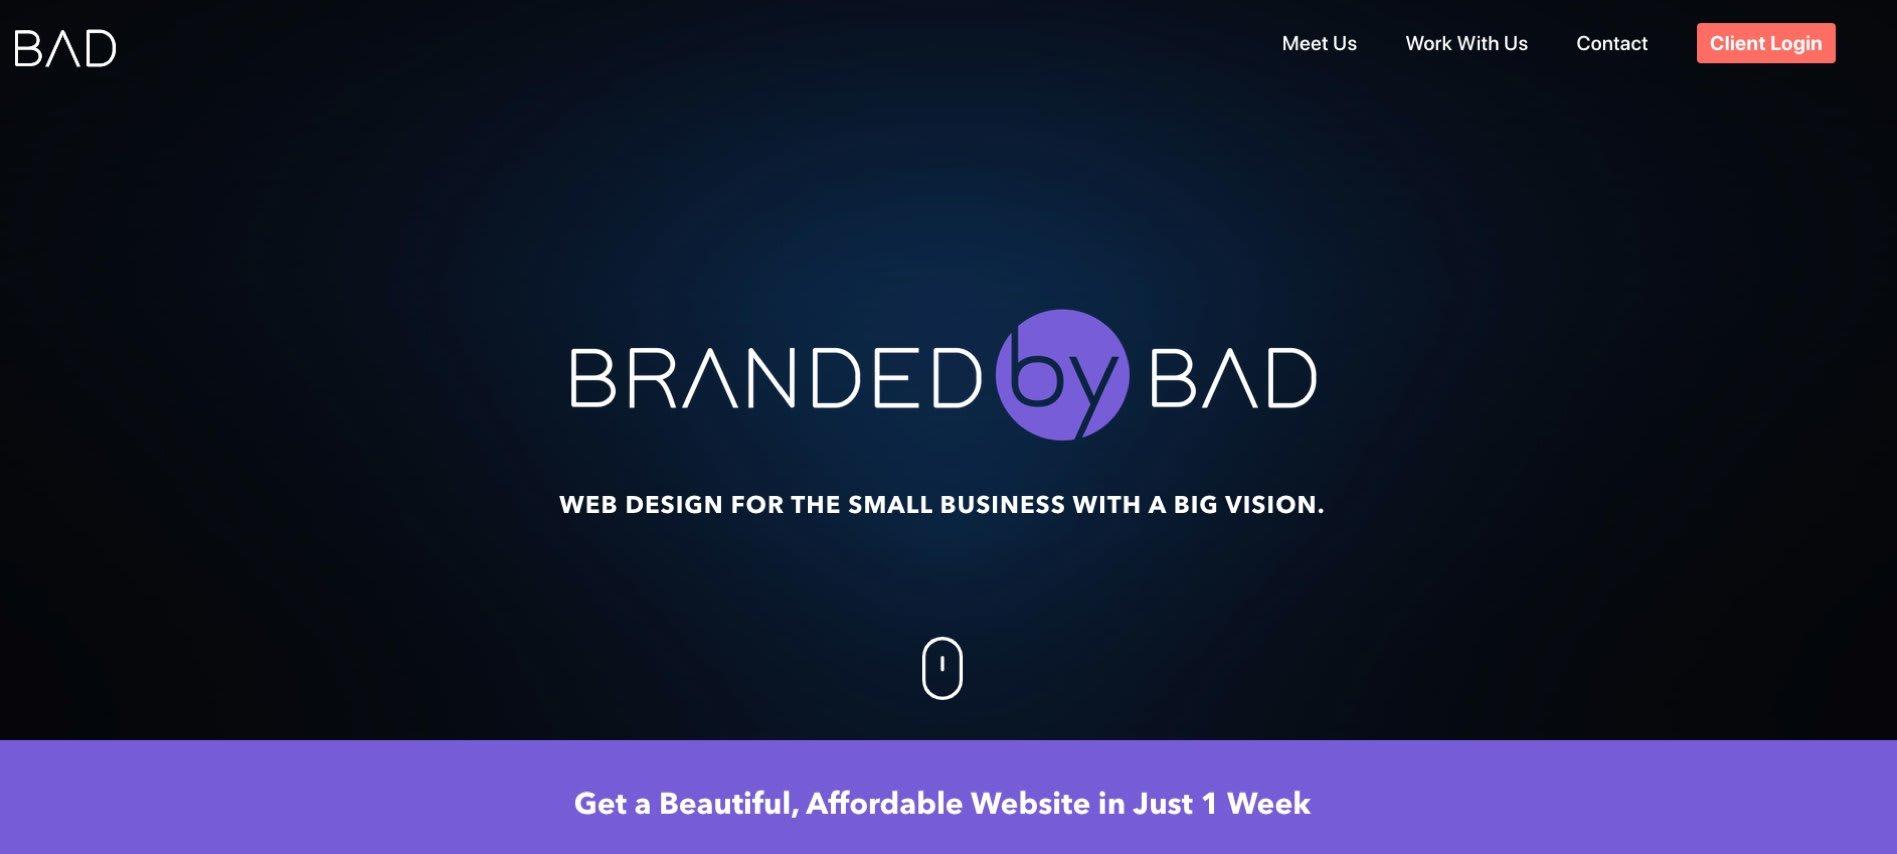 Brandedbybad.com